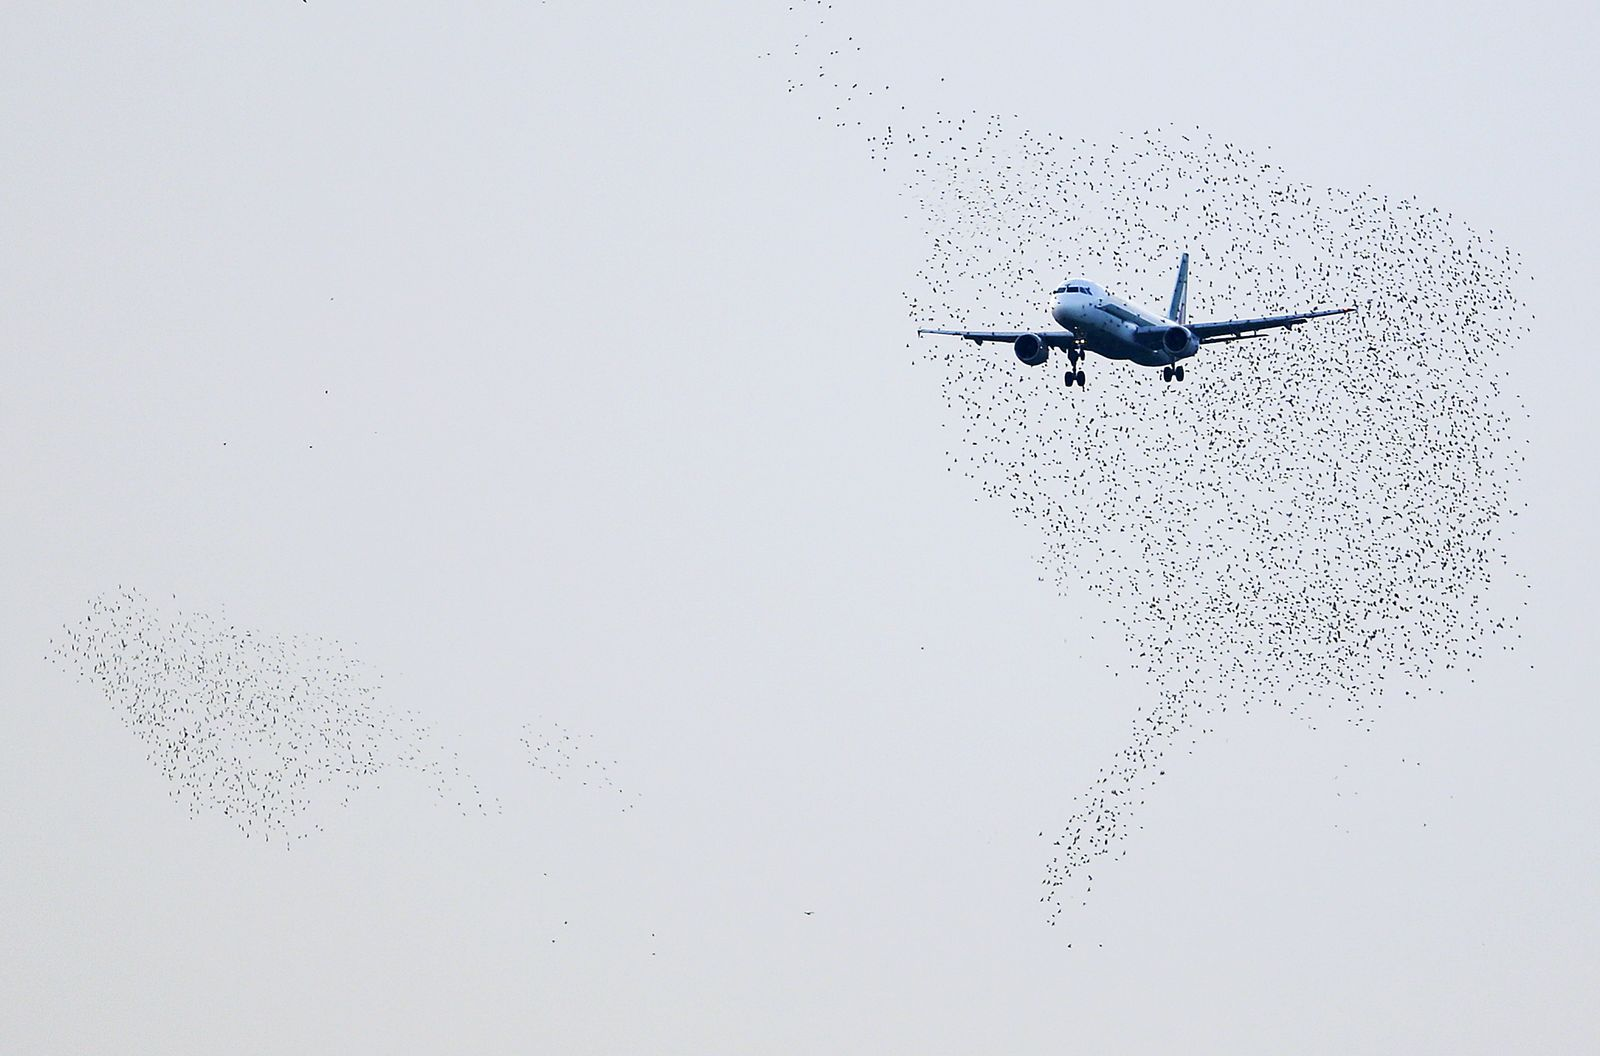 Flughafen/ Tiere/ Vögel